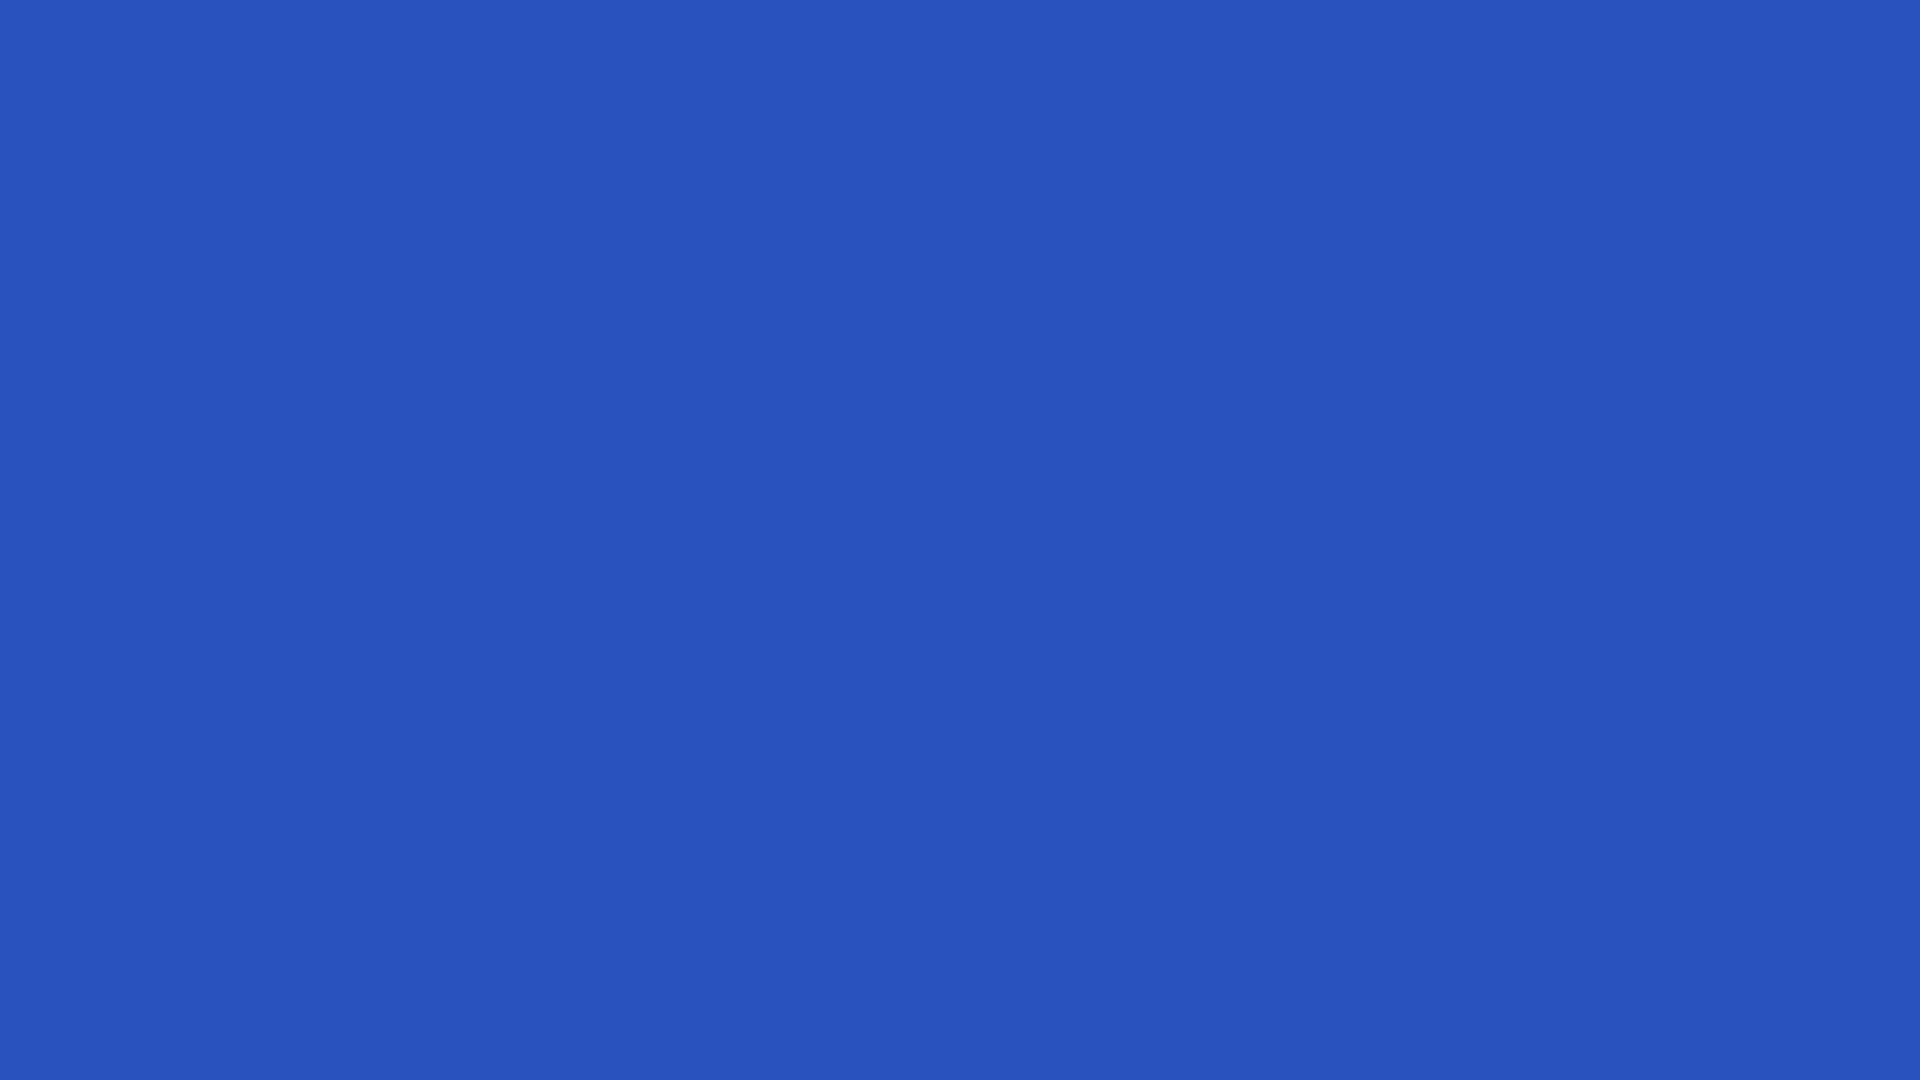 cerulean blue solid color wallpaper